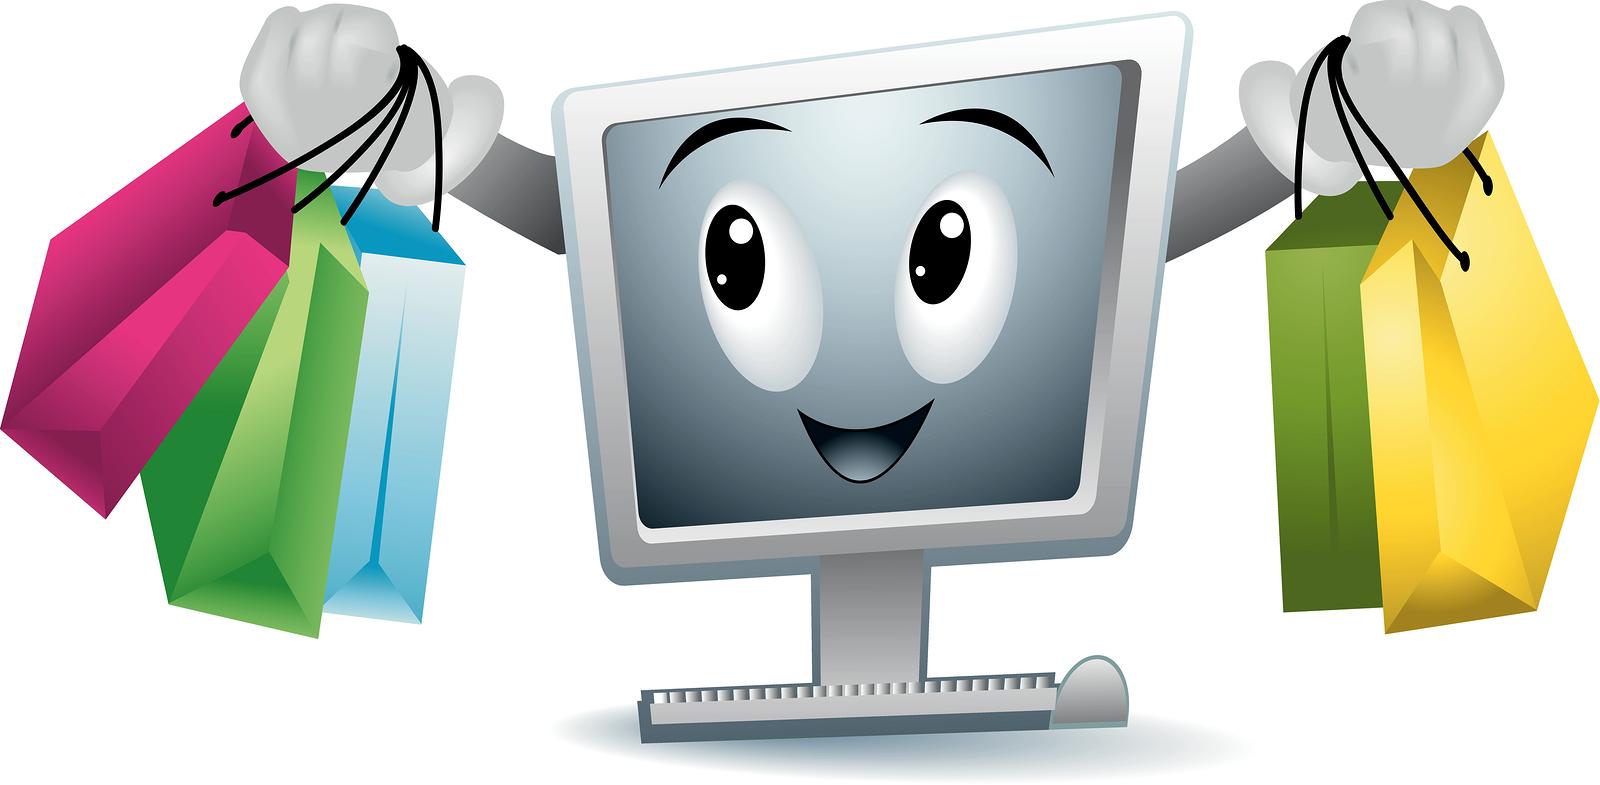 [offer]: Ημέρα προσφορών και αυτή η Τρίτη για το πιστό κοινό του MyGad.gr και για άλλους fans της τεχνολογίας!